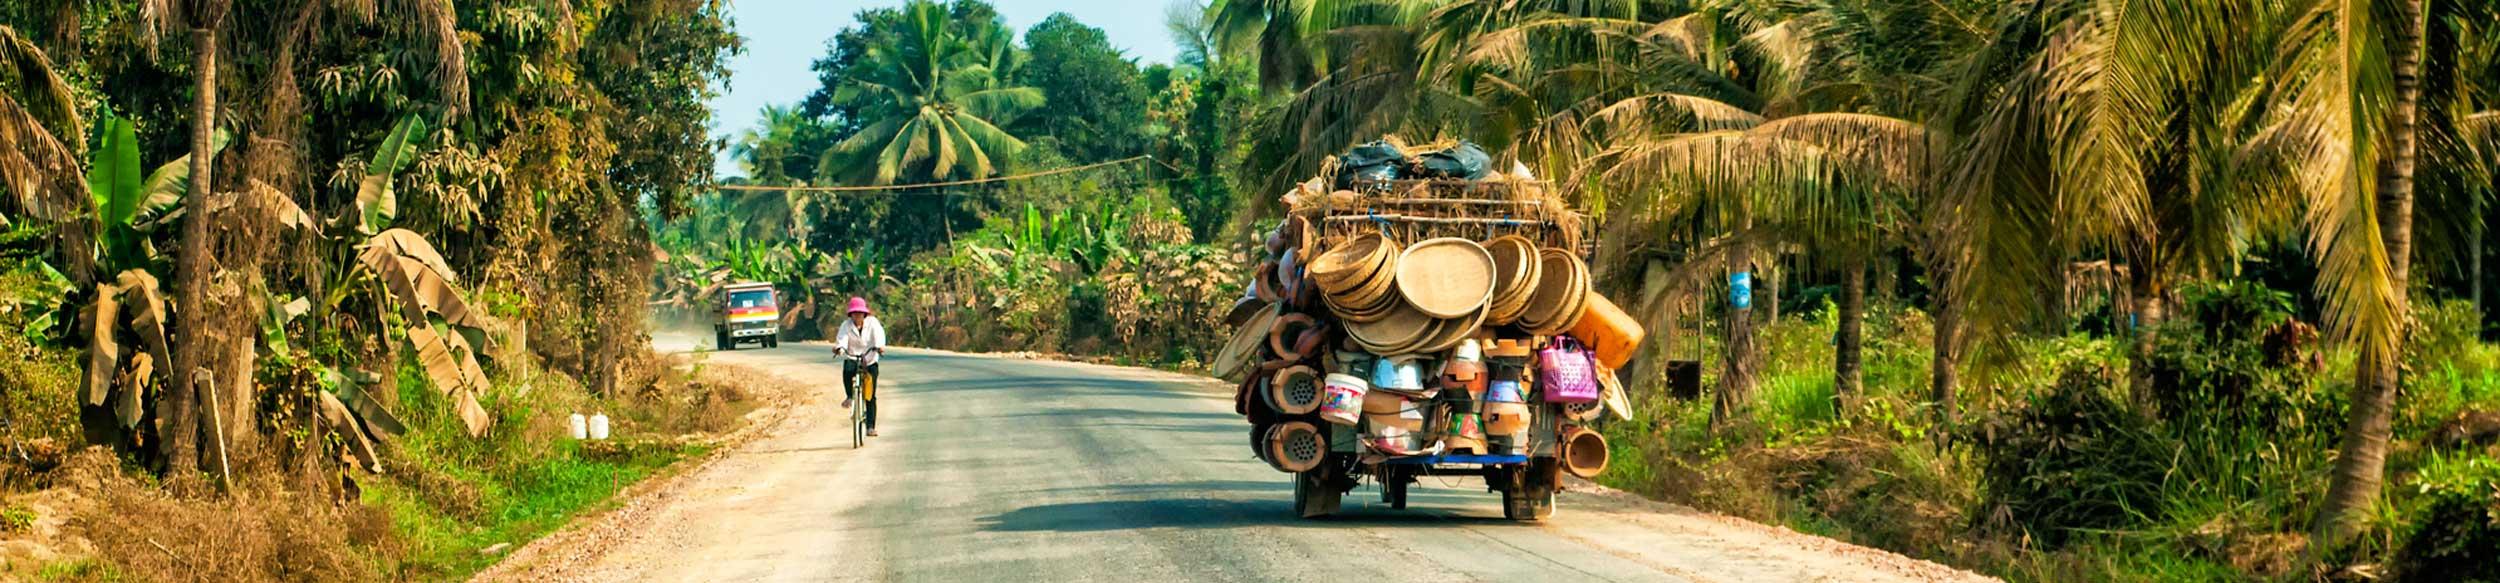 Découvrir Battambang au Cambodge avec Carnets d'Asie